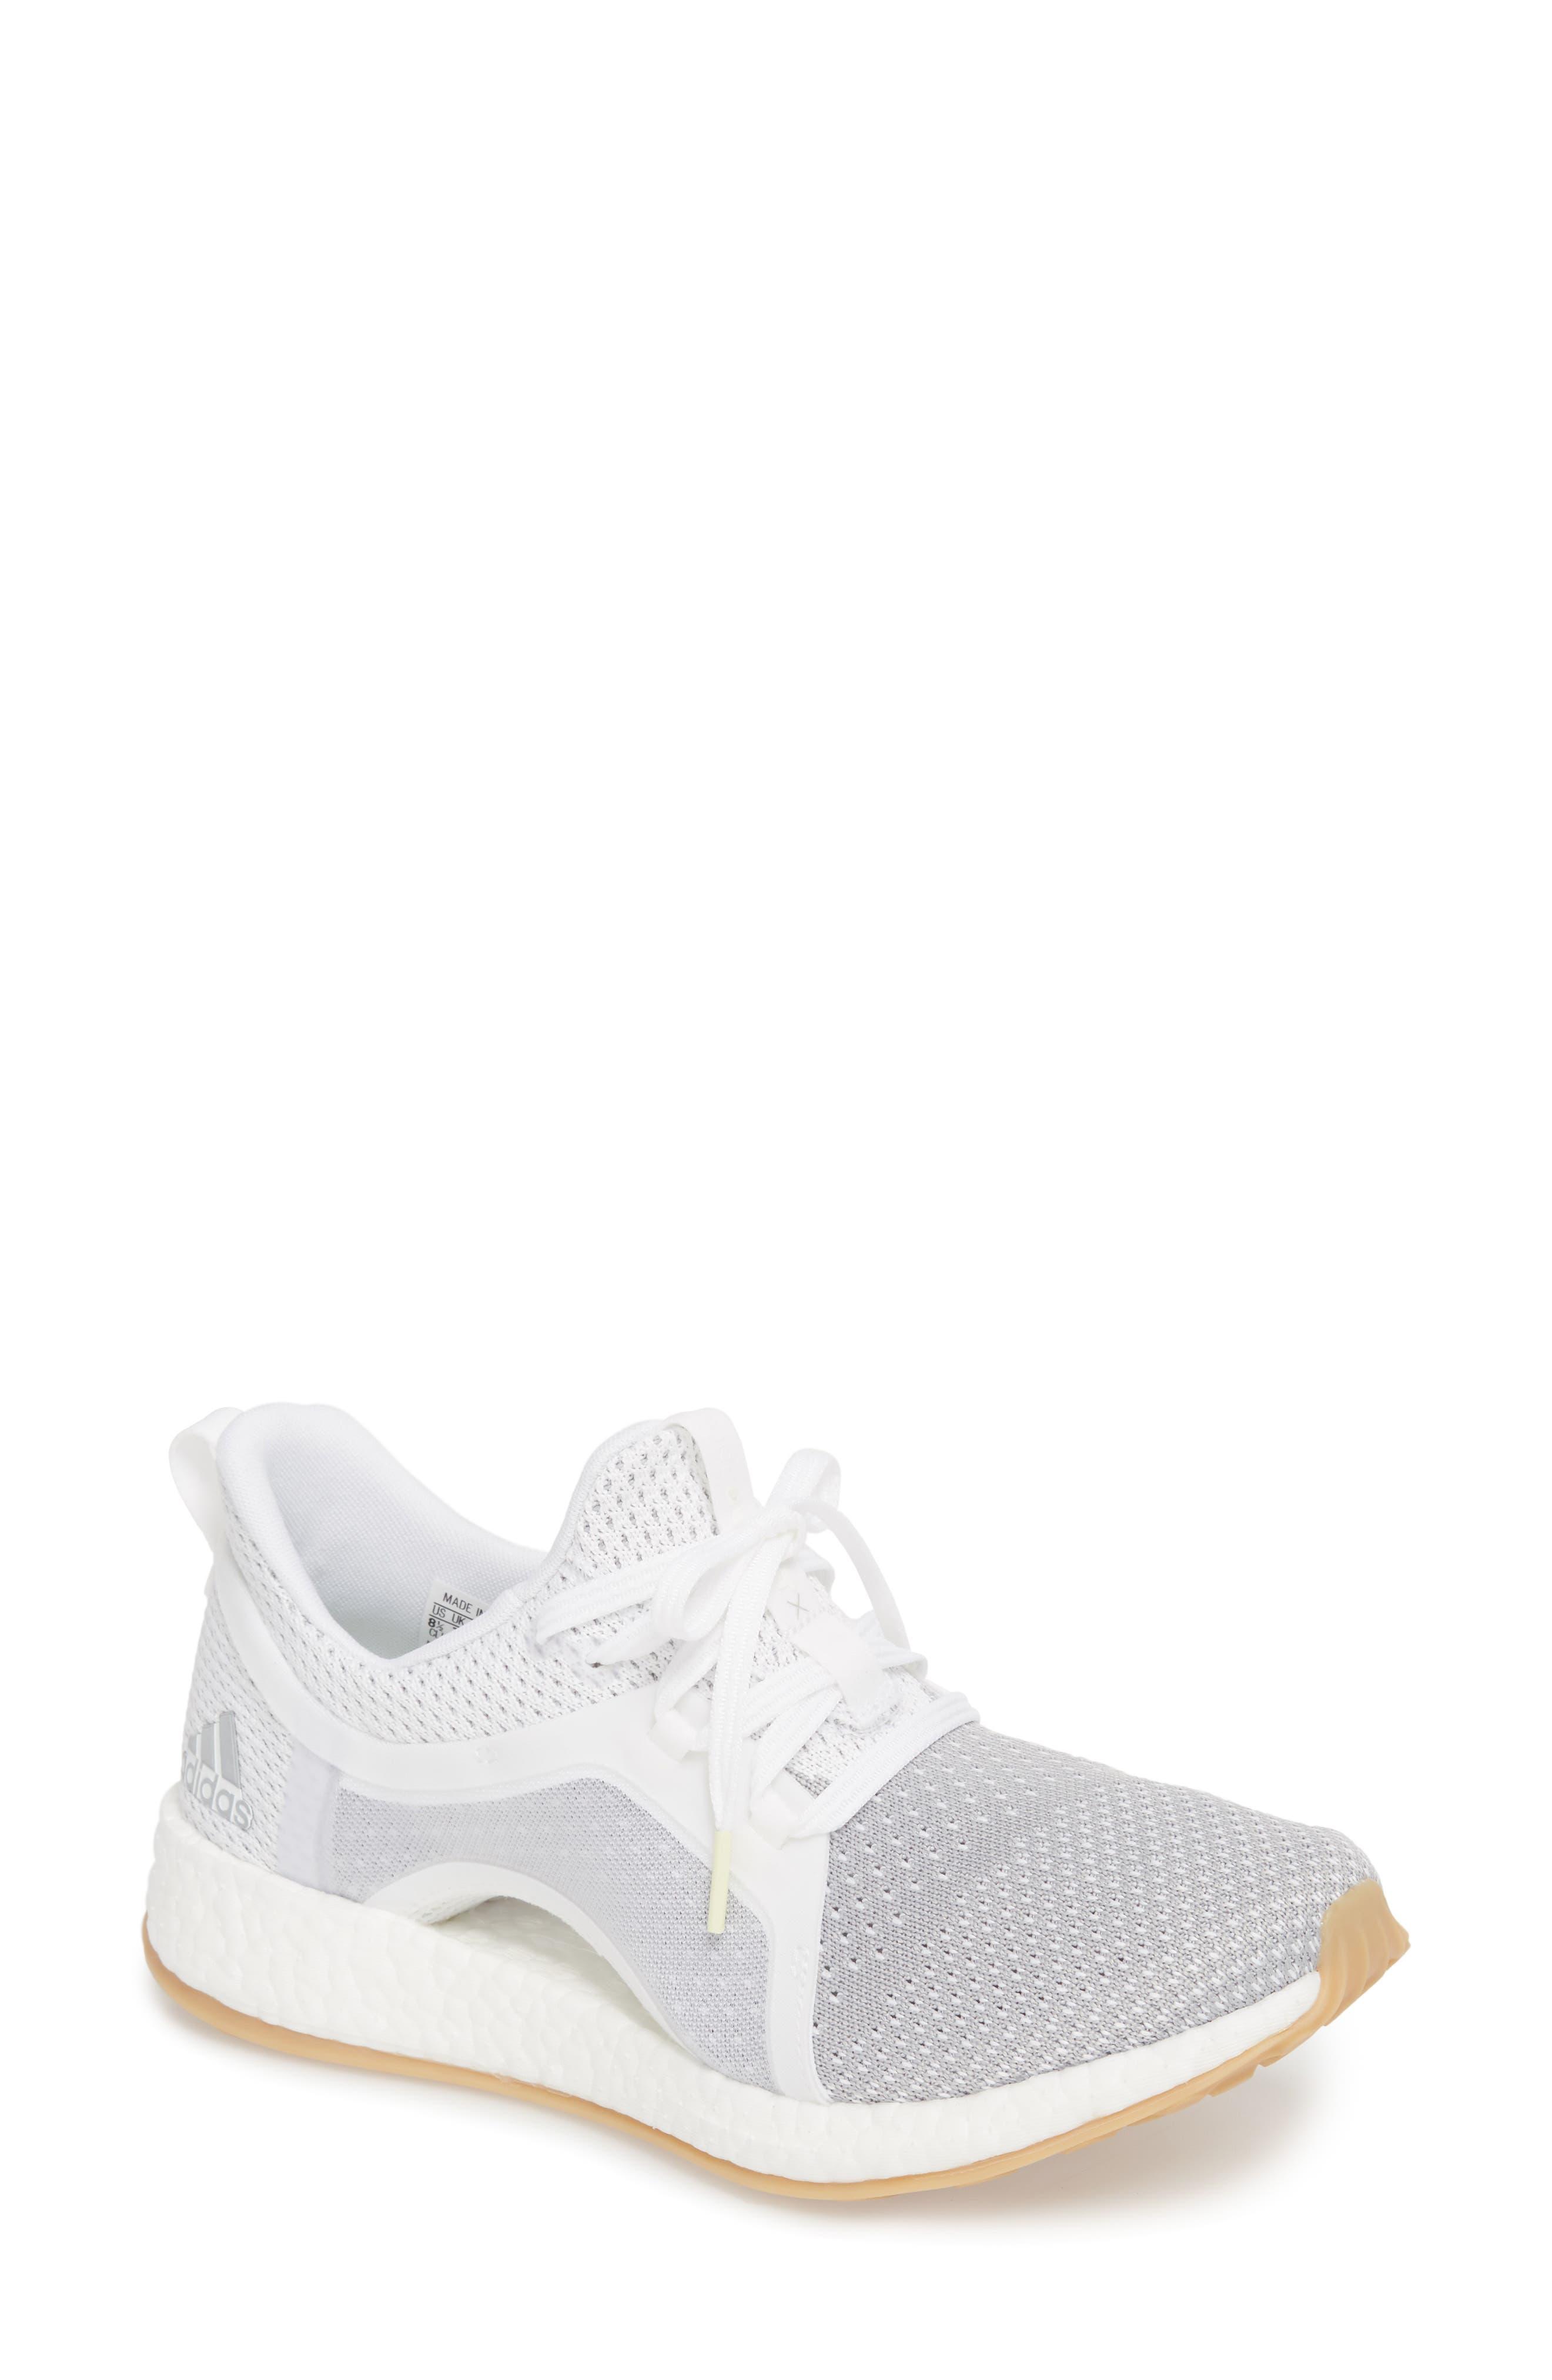 ADIDAS Pureboost X Clima Sneaker, Main, color, 100